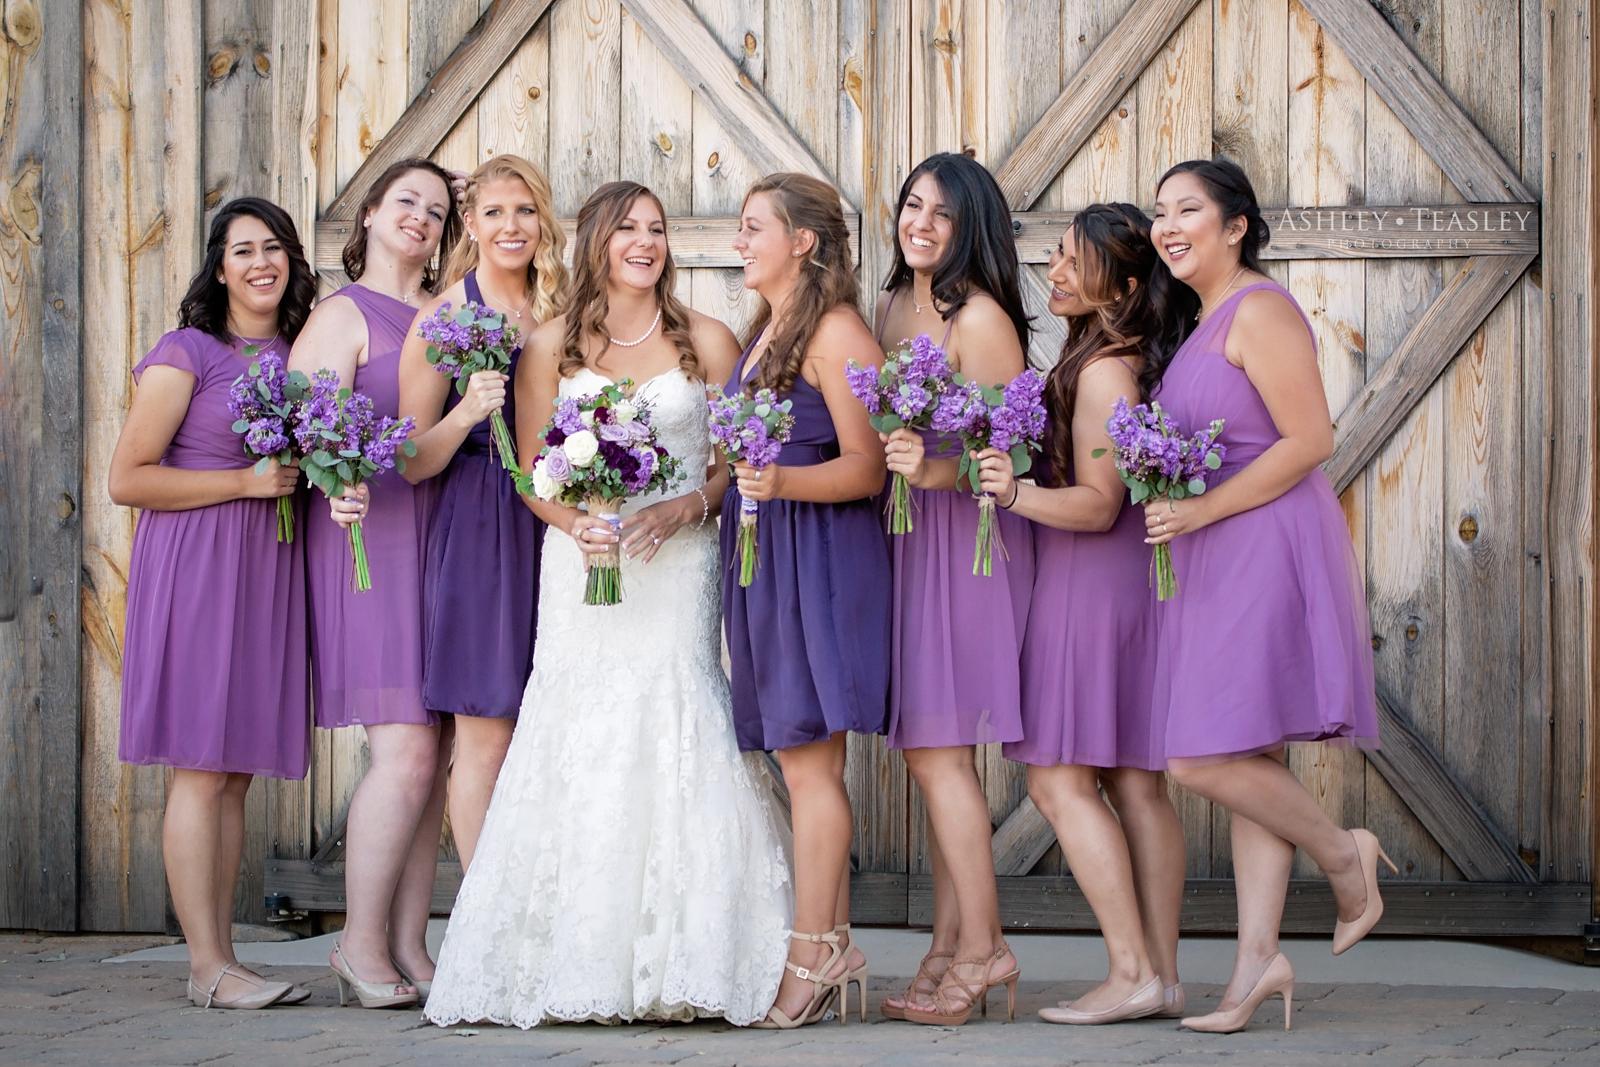 Ashley Teasley Photography - Amador Cellars Winery - Sacramento Wedding Photographer-117.JPG